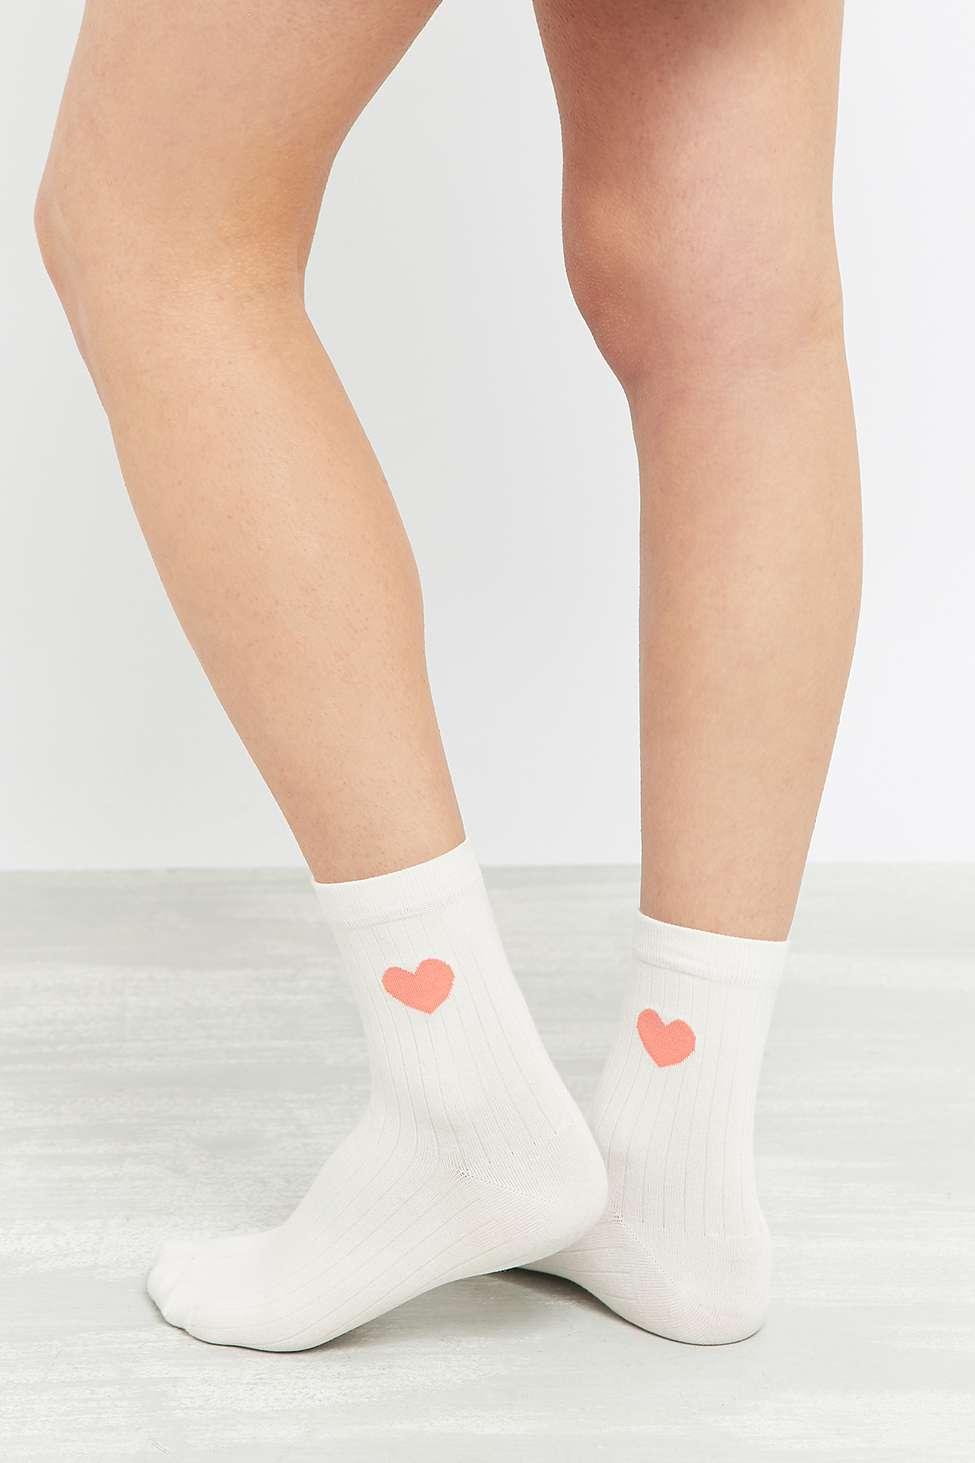 Chaussettes à motif coeur Urban outfitters